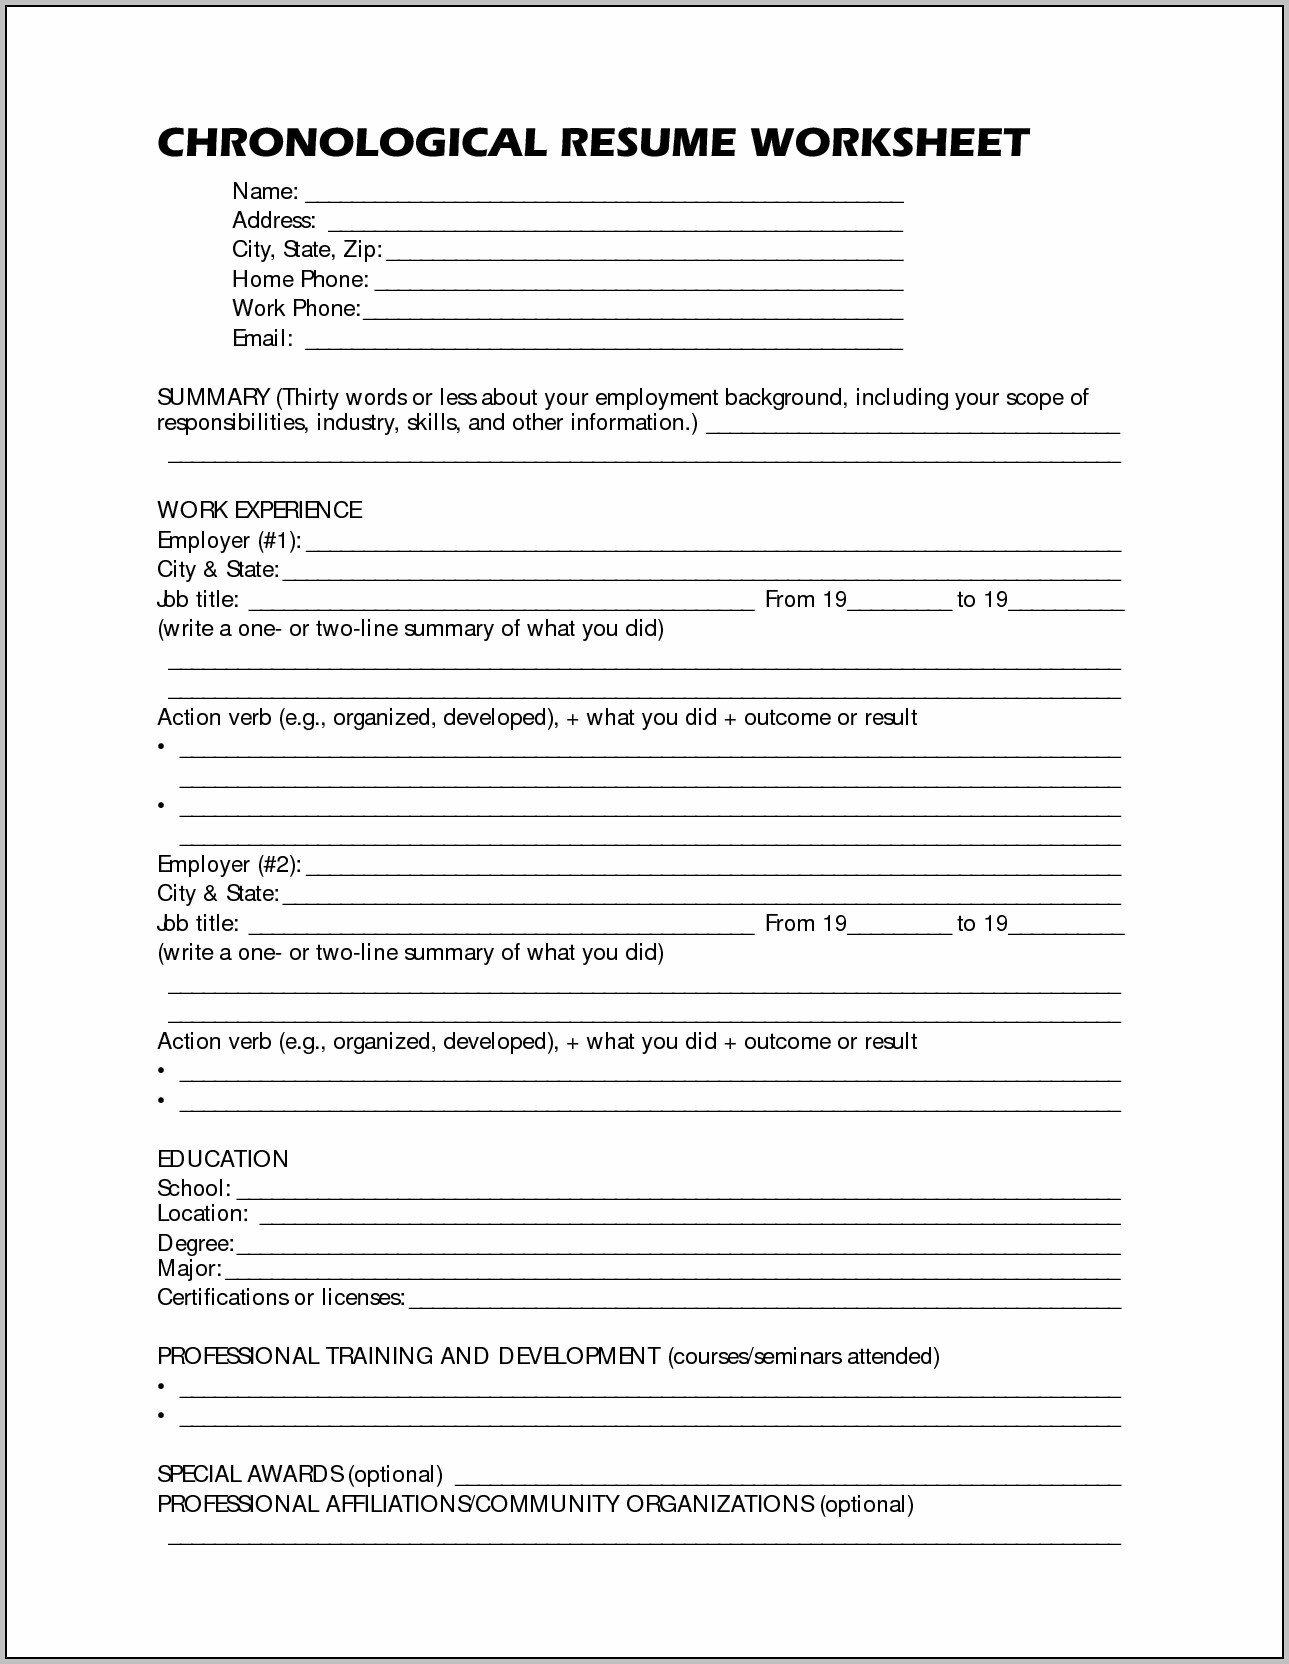 Free Printable Resume Worksheet   Shop Fresh - Free Printable Resume